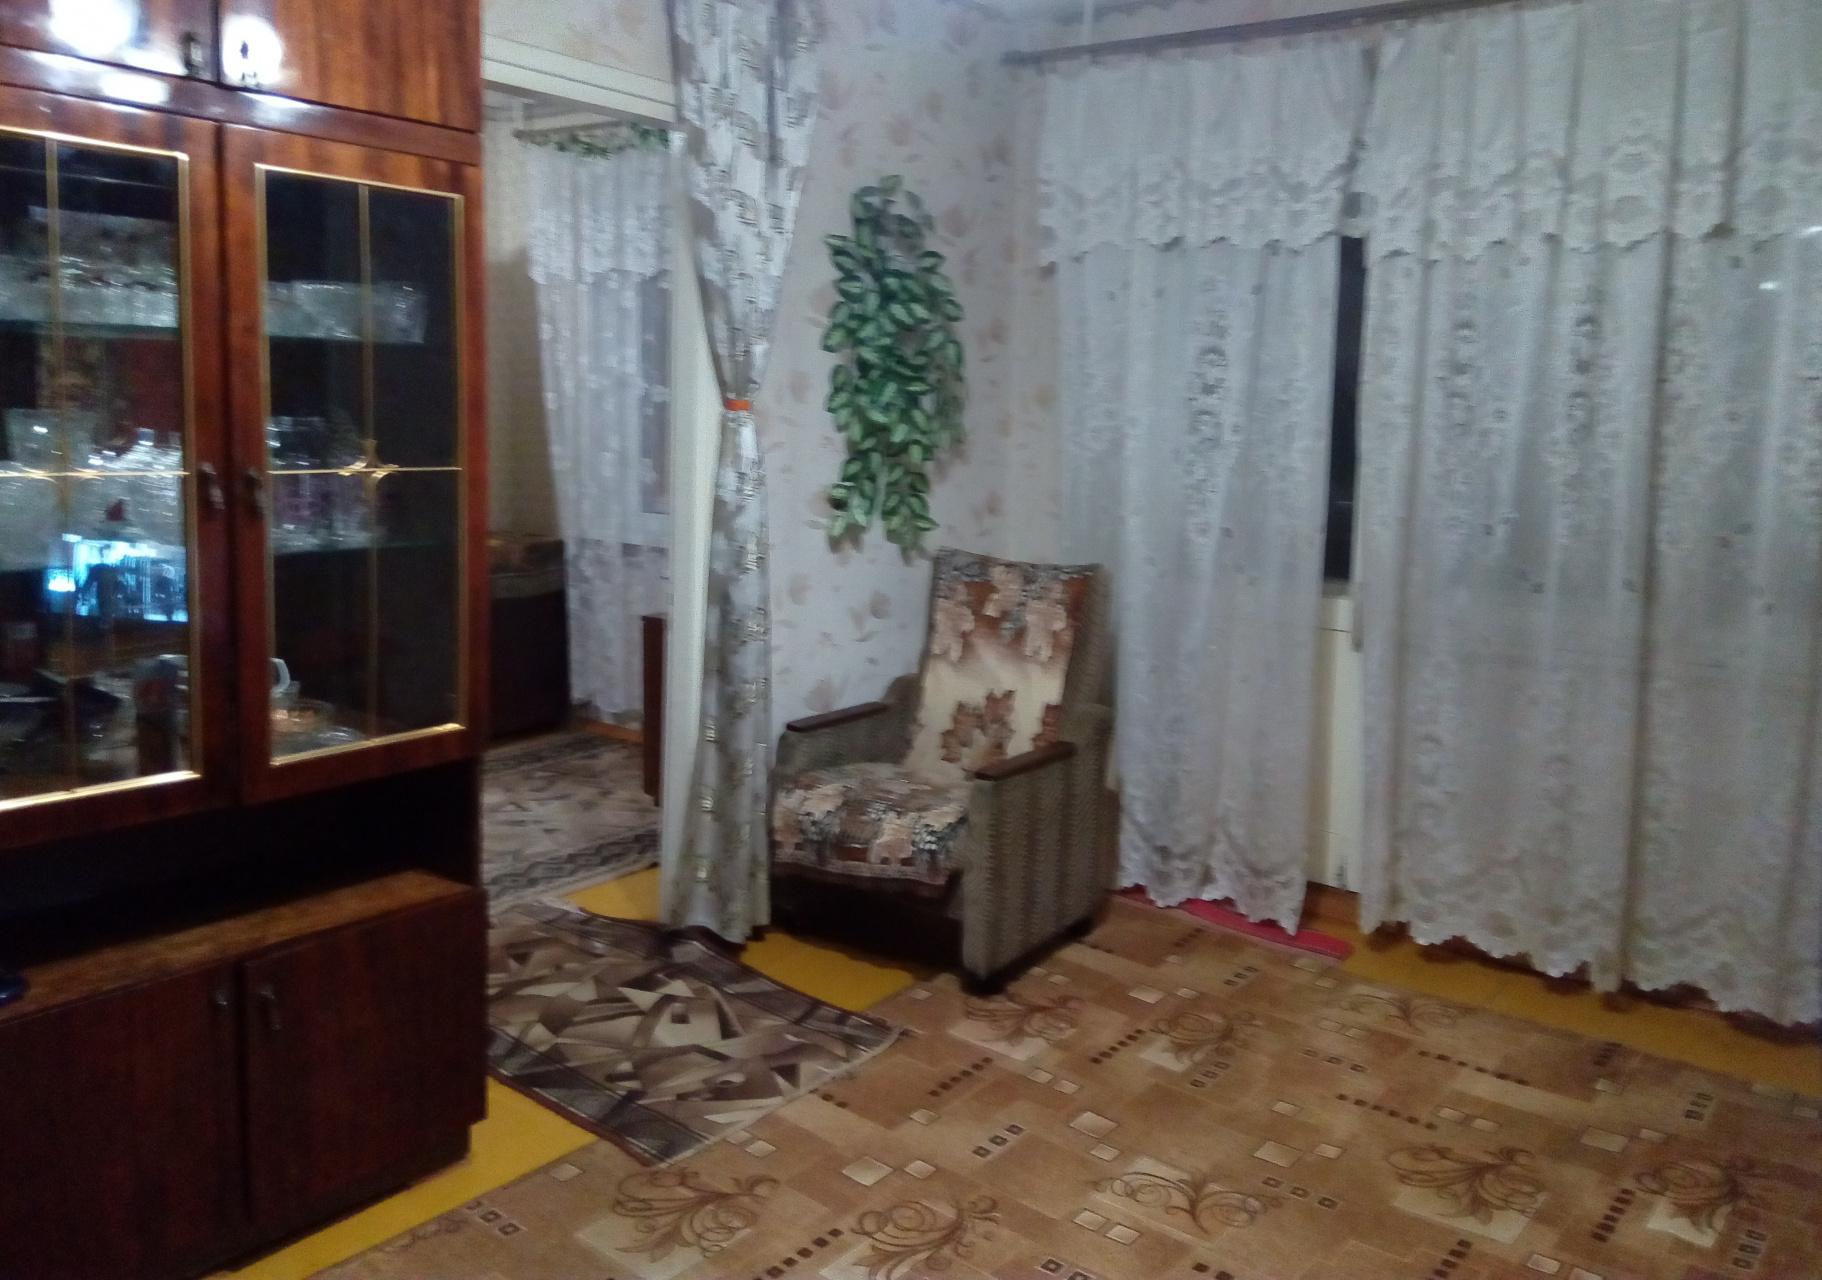 Продажа 2-комнатной квартиры Академика Баха ул., 9, к 1, Нижний Новгород